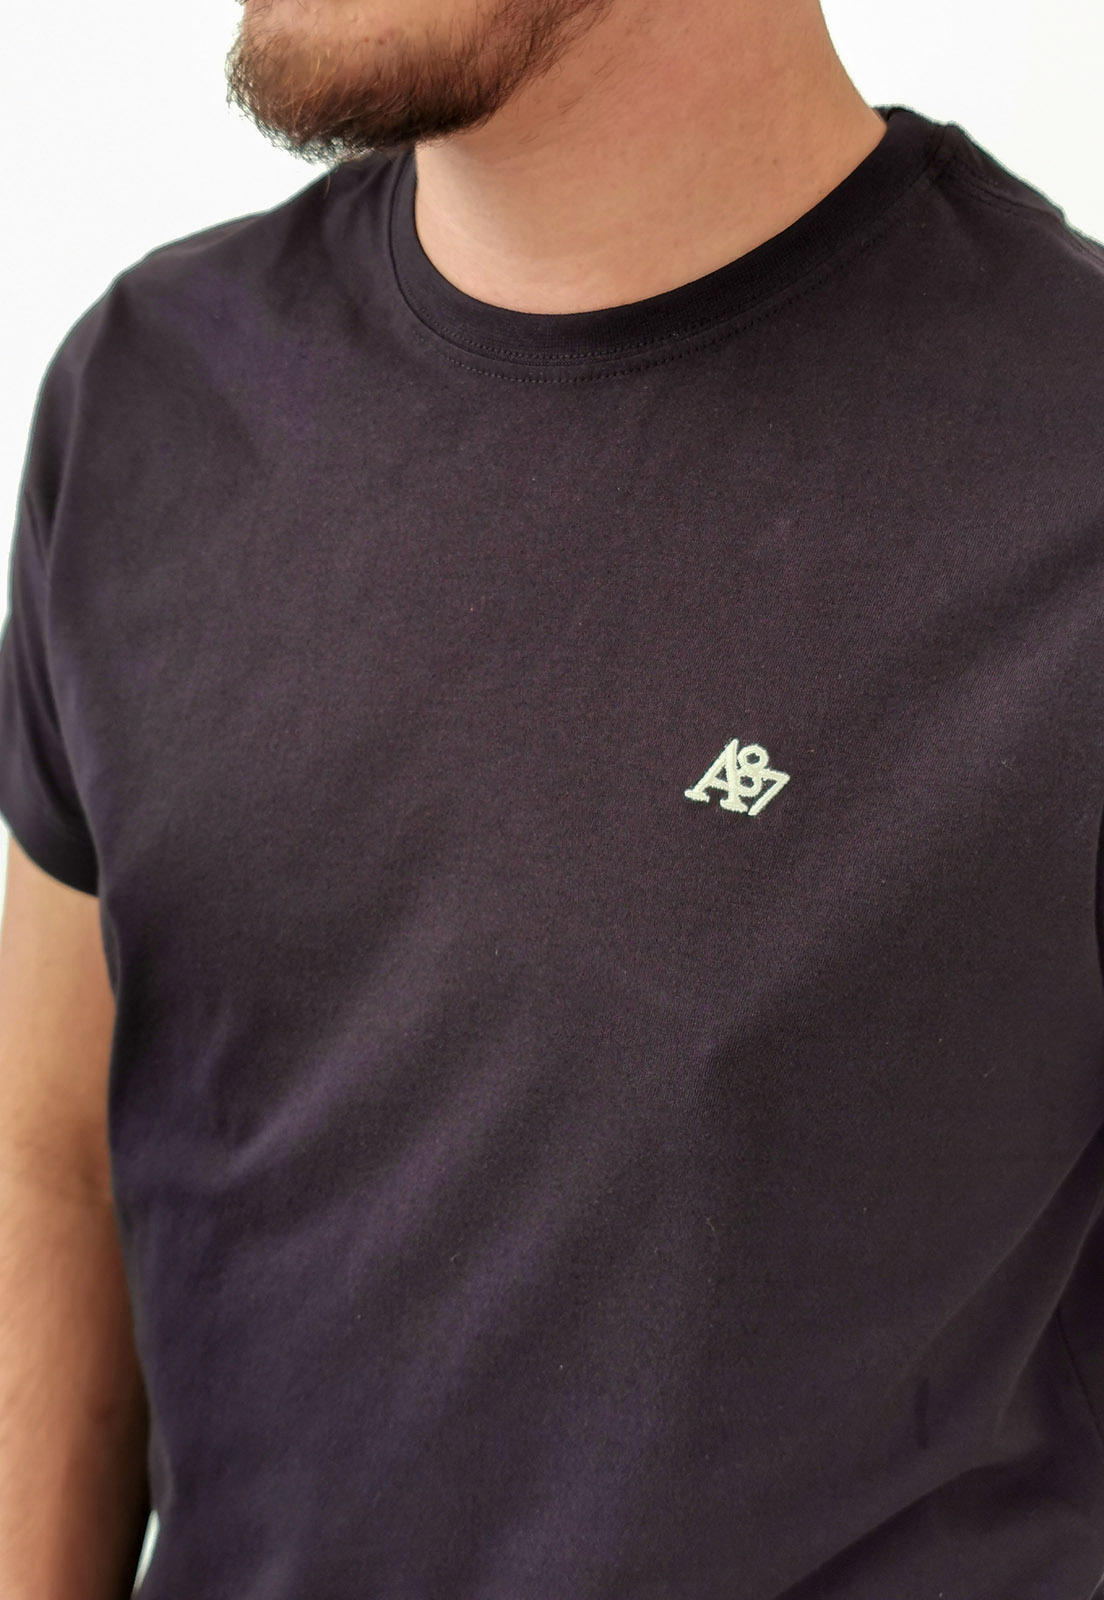 Camiseta Aéropostale Básica Preto